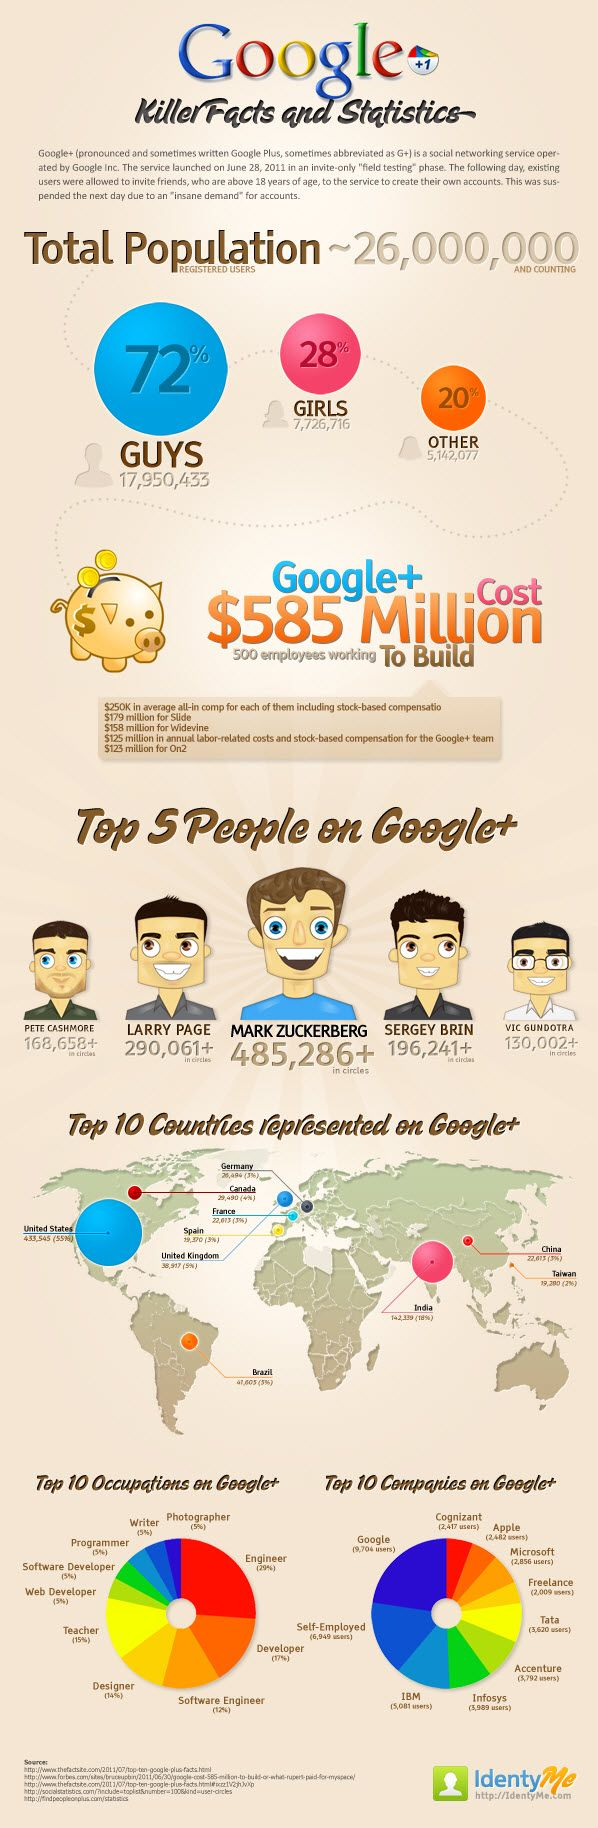 Facts about Google+Social Network, Smart People, Social Media Marketing, Google, The Killers, Media Infographic, Killers Facts, Statistics Infographic, Socialmedia